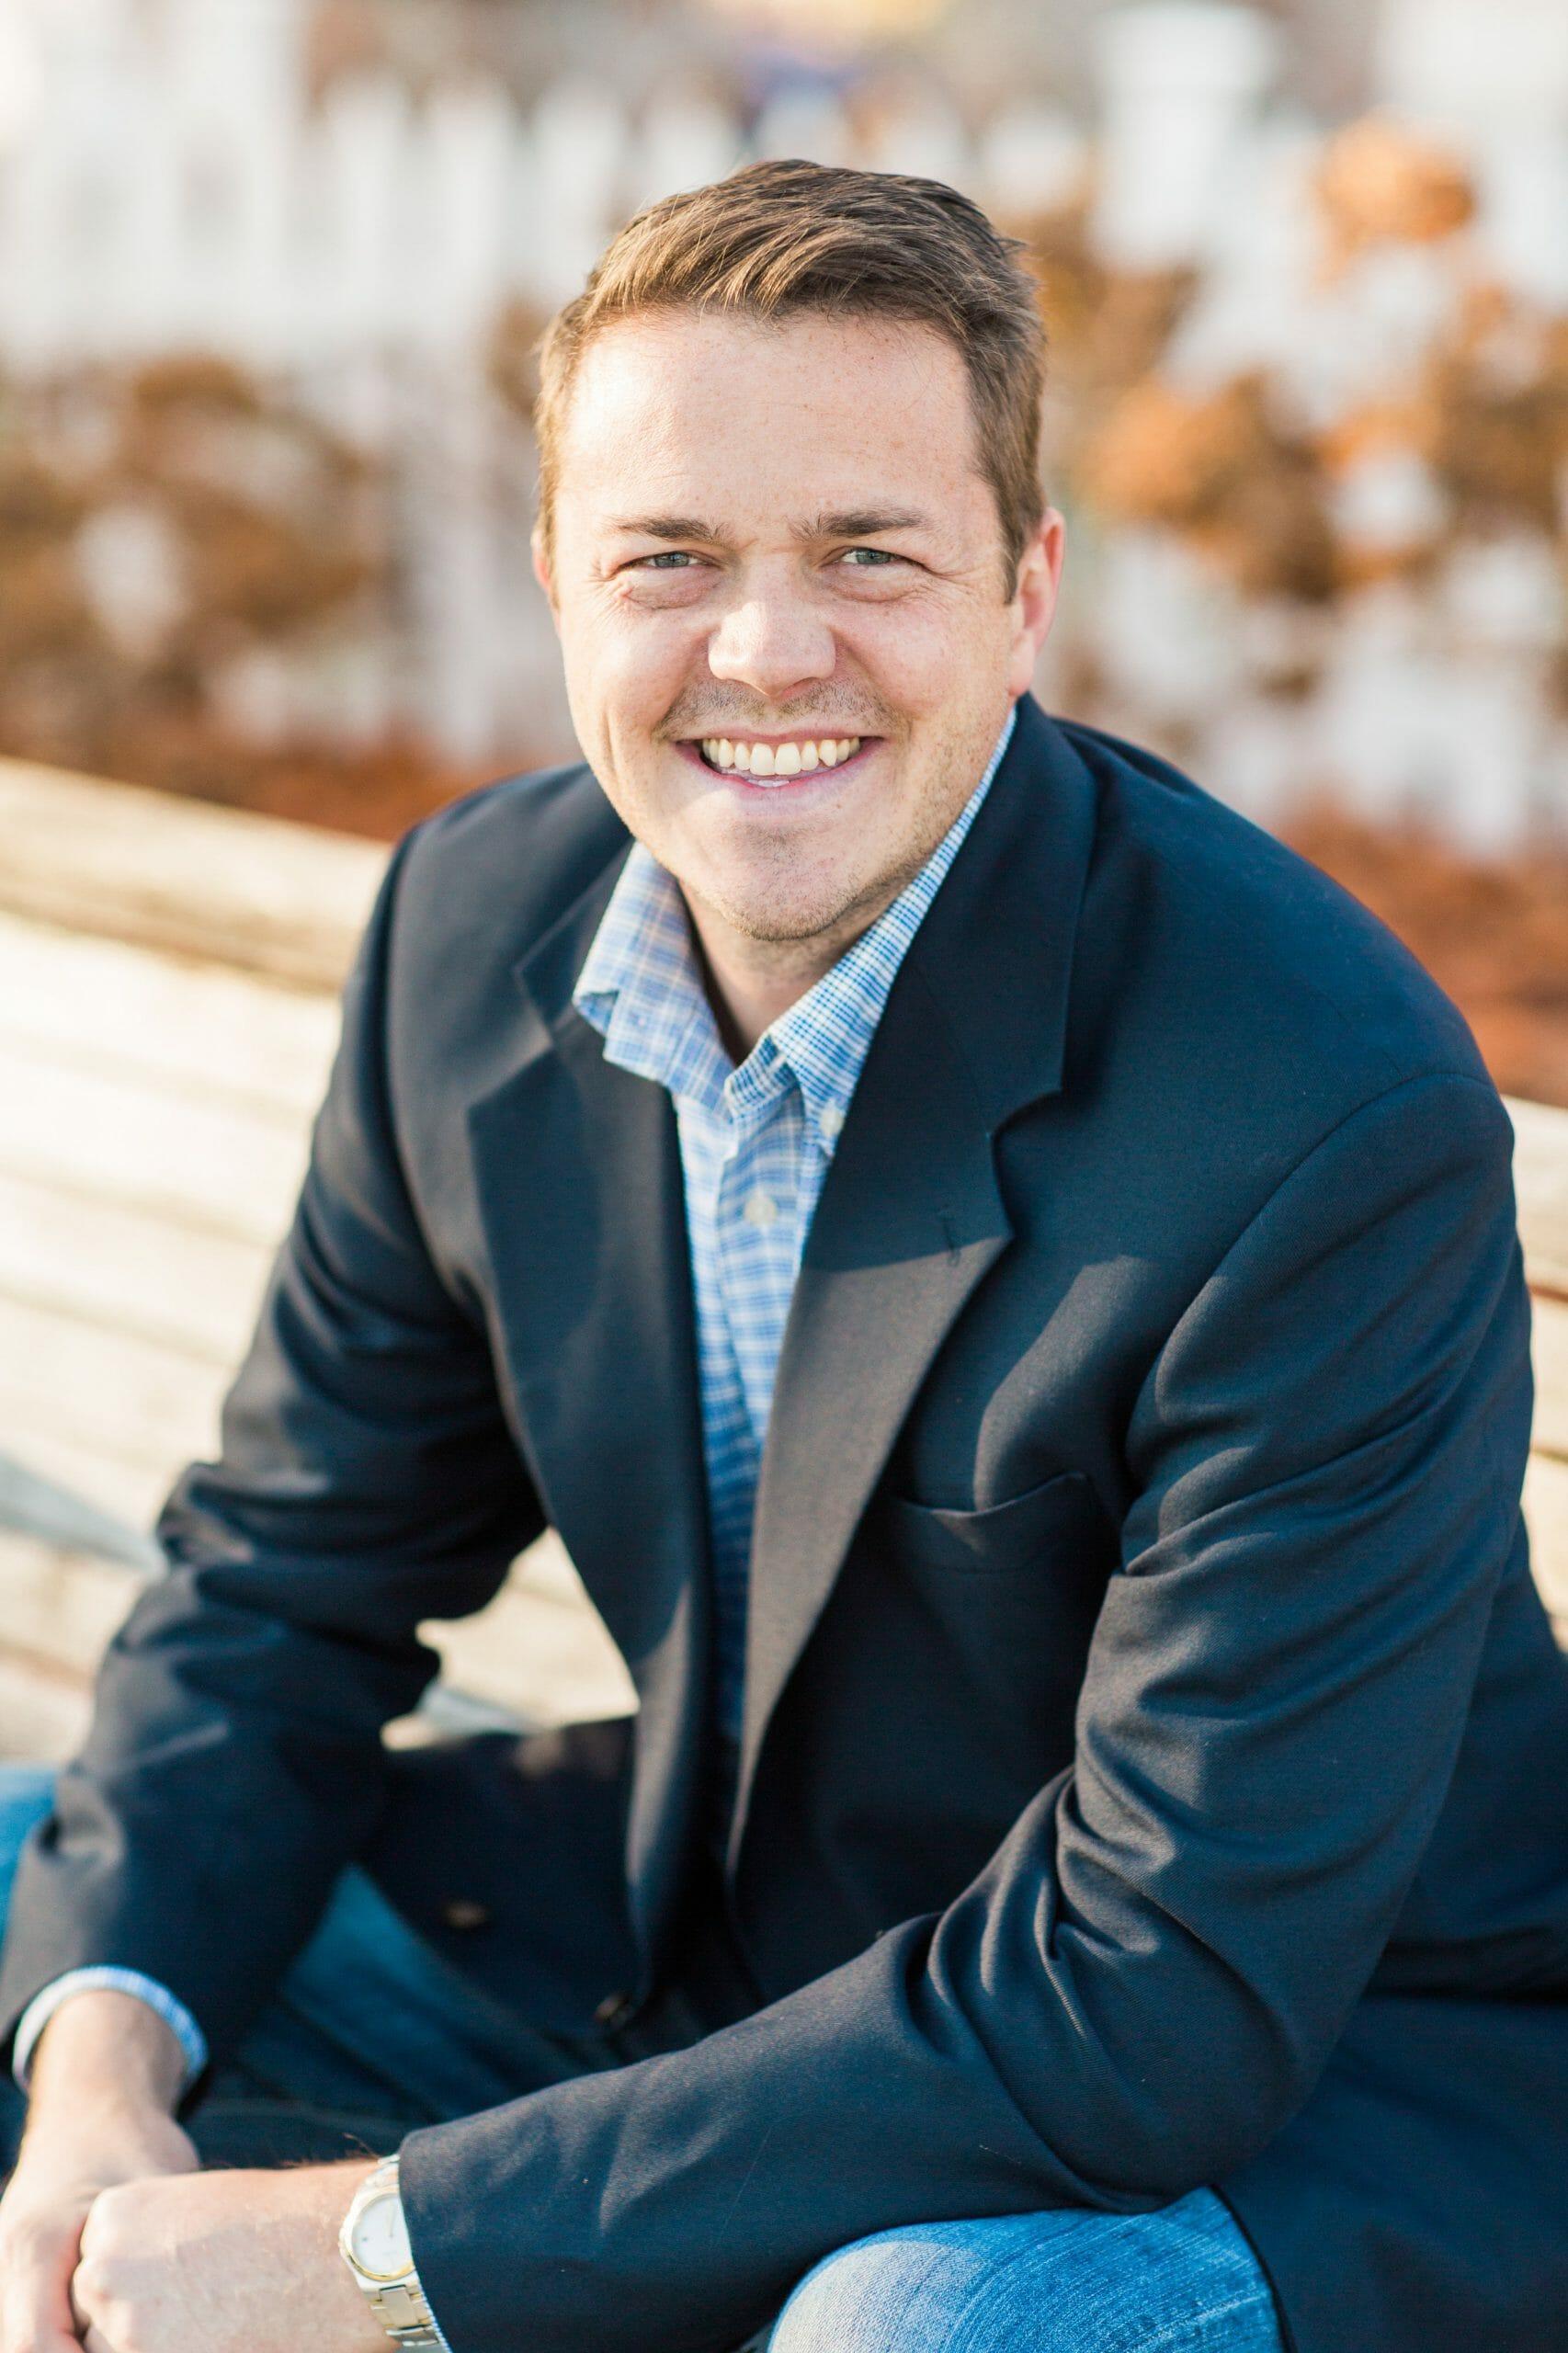 Todd DeKruyter